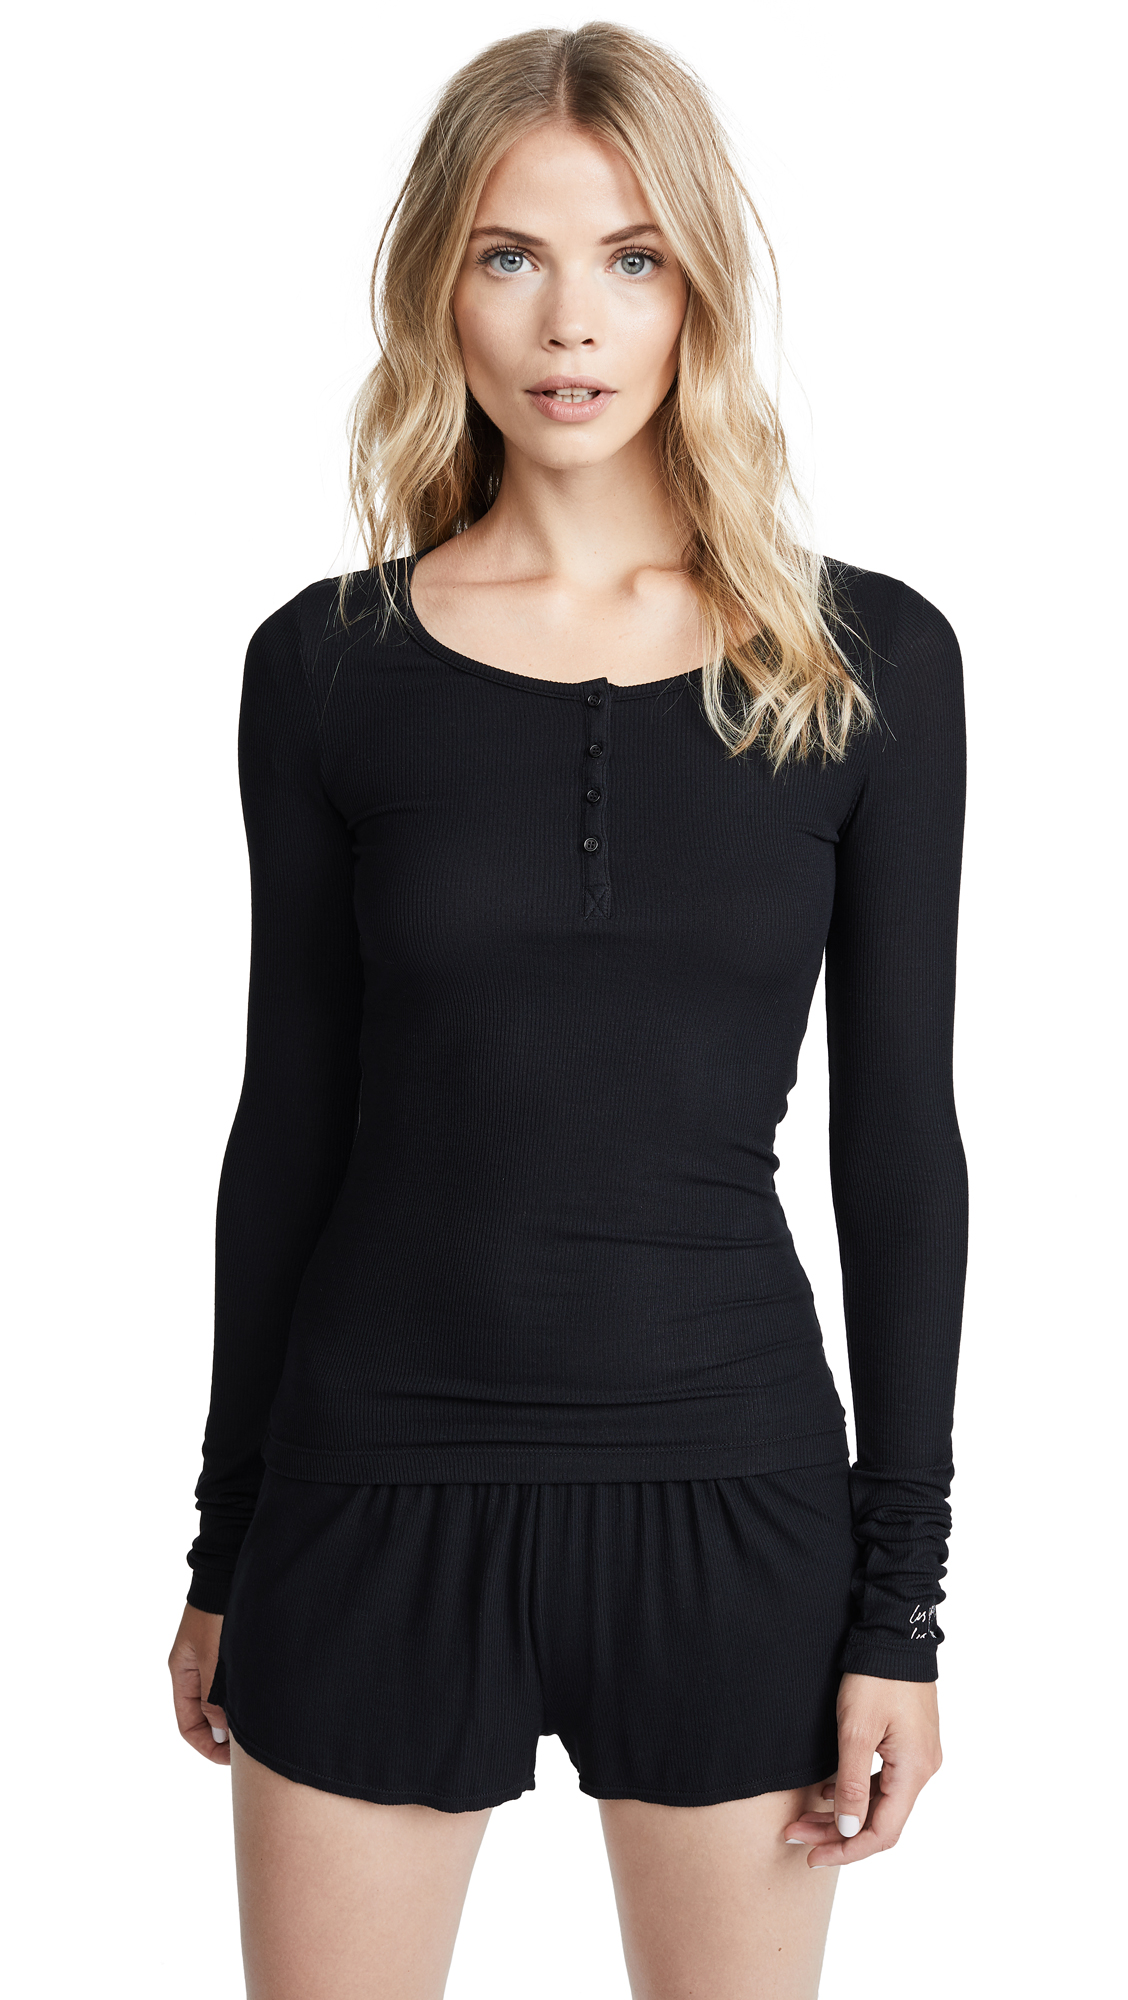 LES GIRLS LES BOYS Fine Rib Long Sleeve Henley in Black